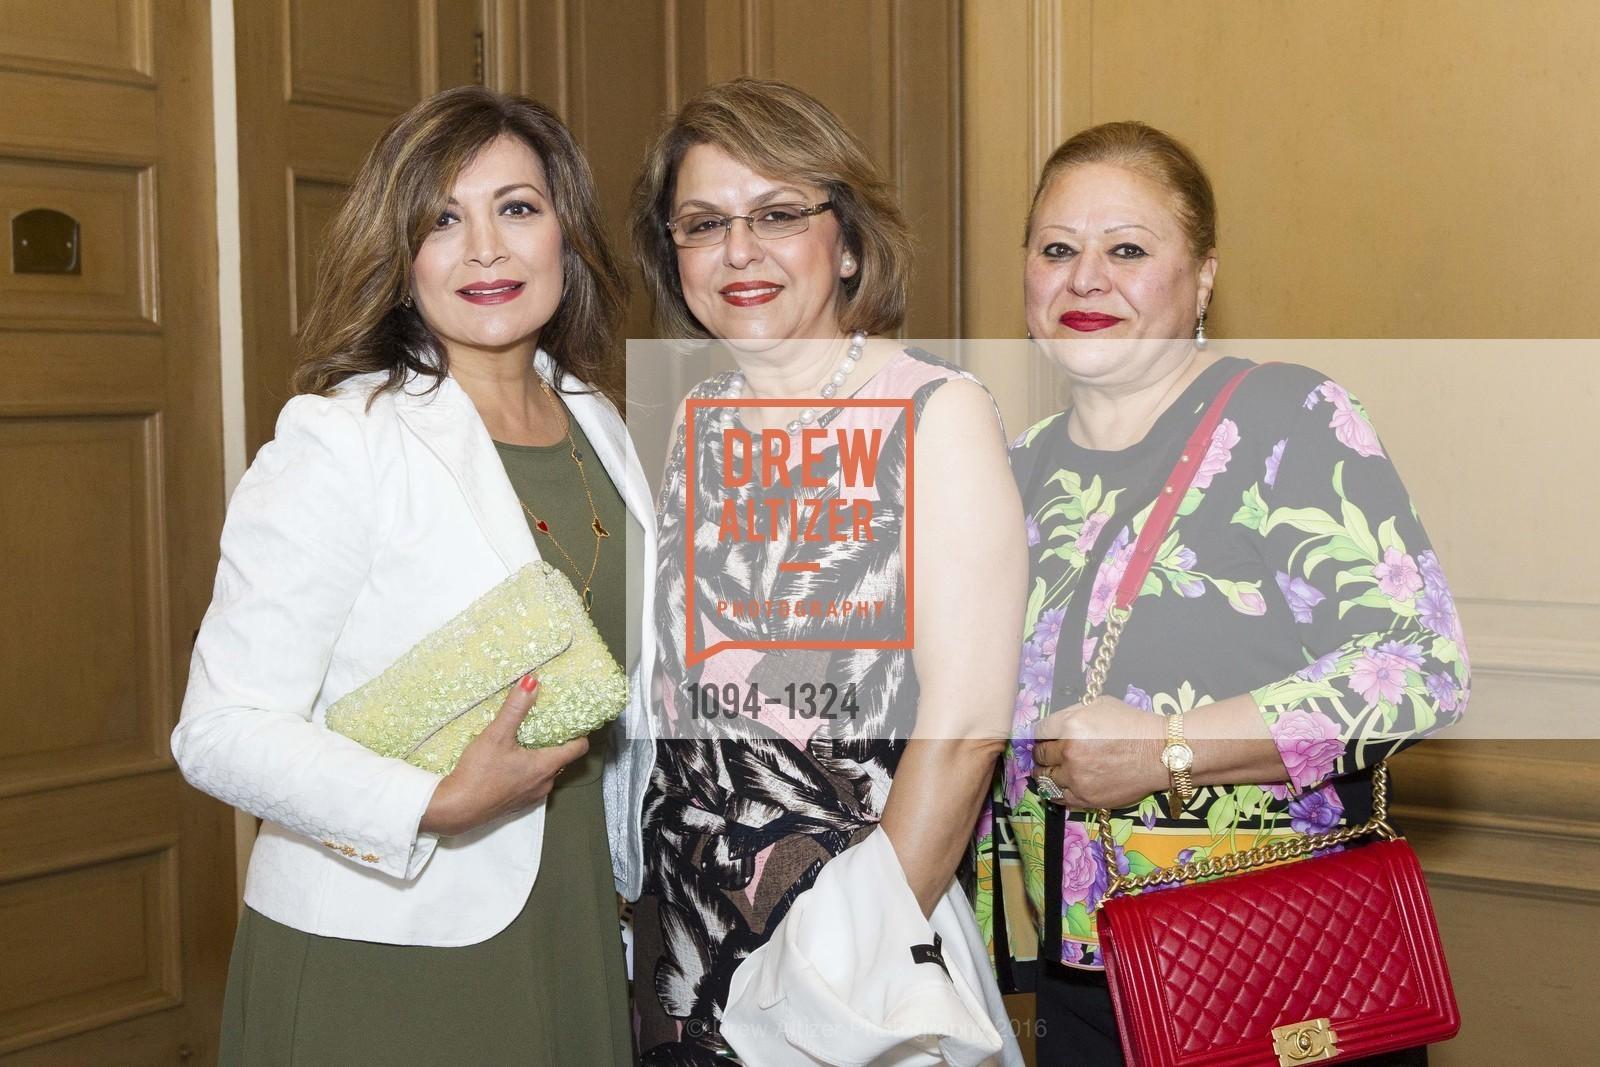 Kathy Razadi, Mina Beigi, Susan Ghasemy, Photo #1094-1324